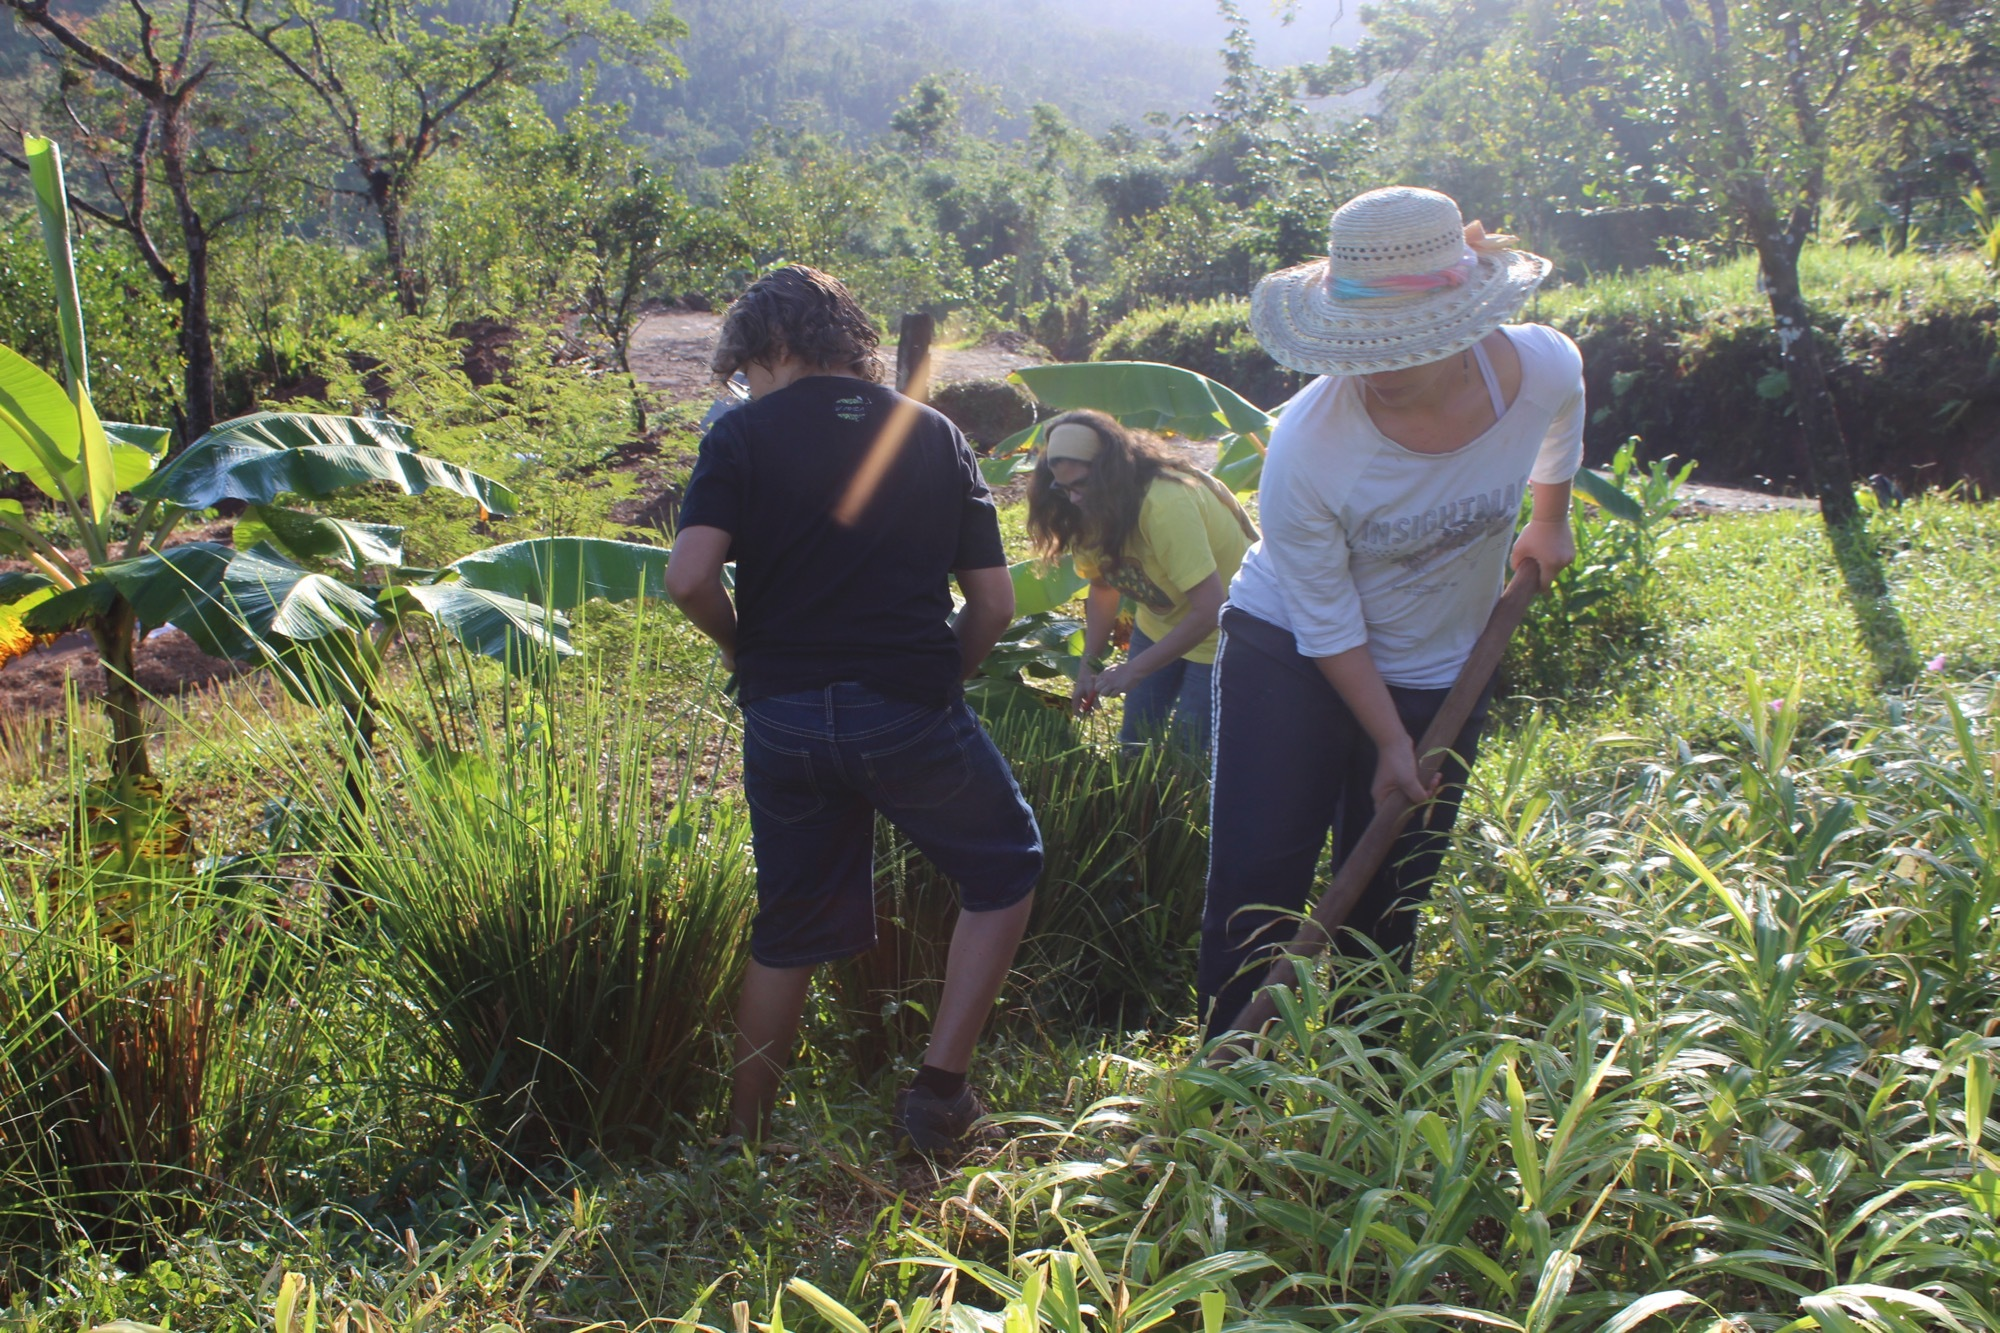 Working the Land at Plenitud PR